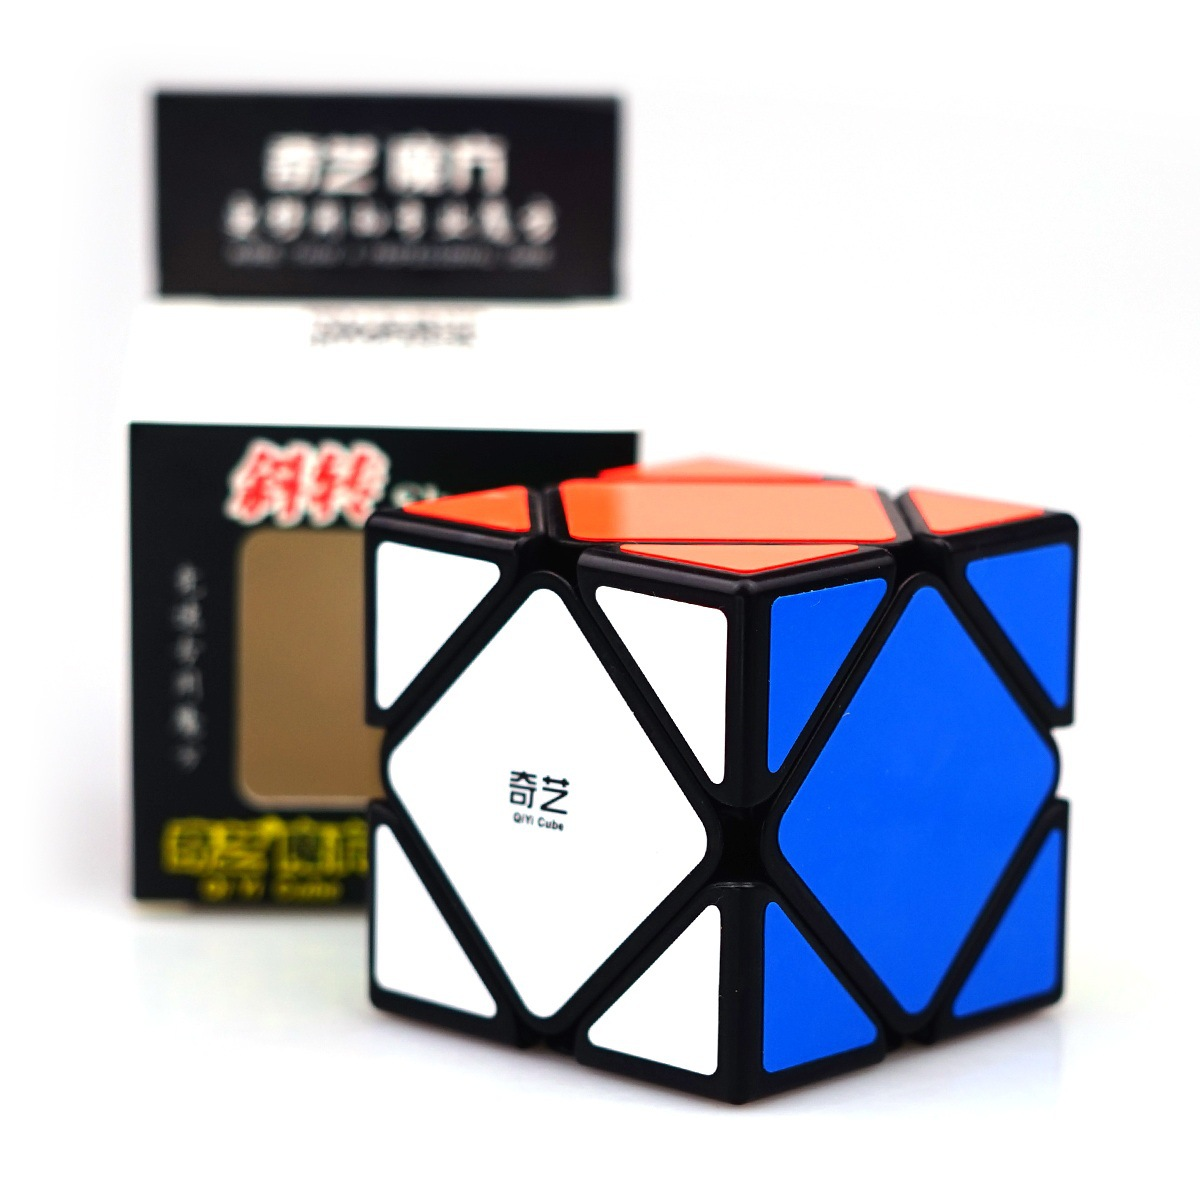 Qiyi QiCheng A Speed Magic Cube Skewed  Speed Cube Magic Bricks Block Brain Teaser New Year Gift Toys For Children